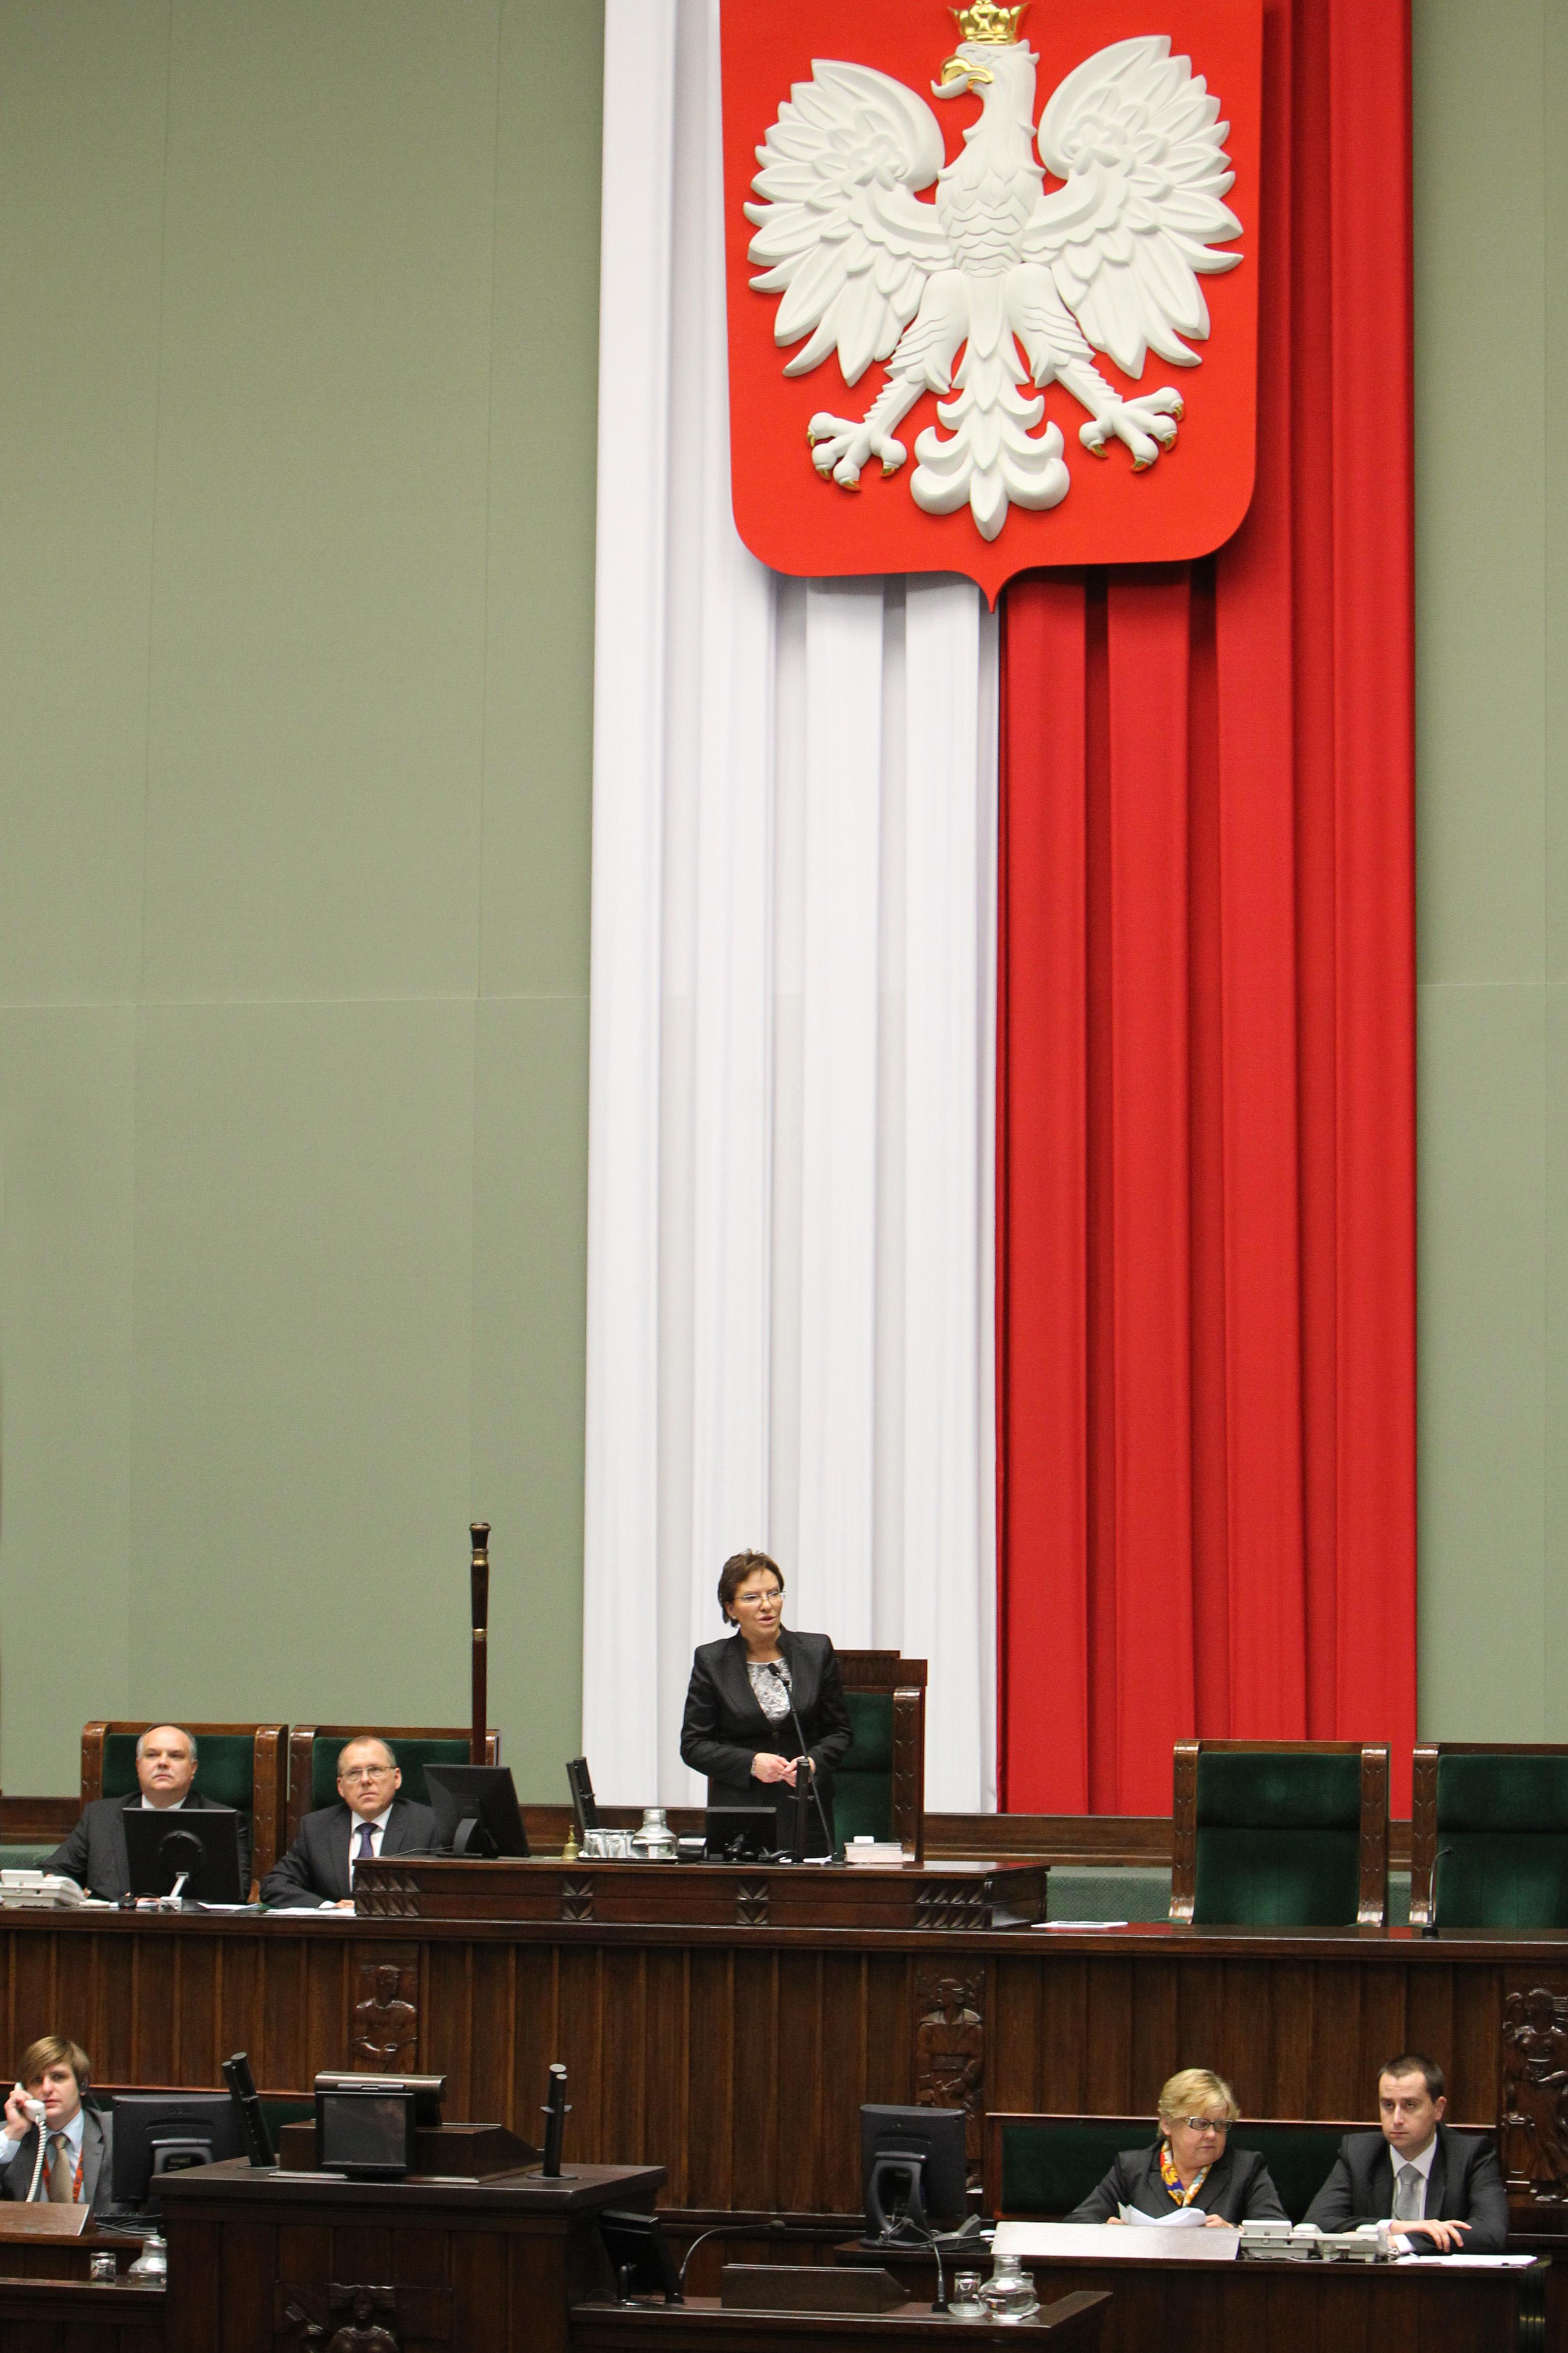 Parlamentspräsidentin Ewa Kopacz